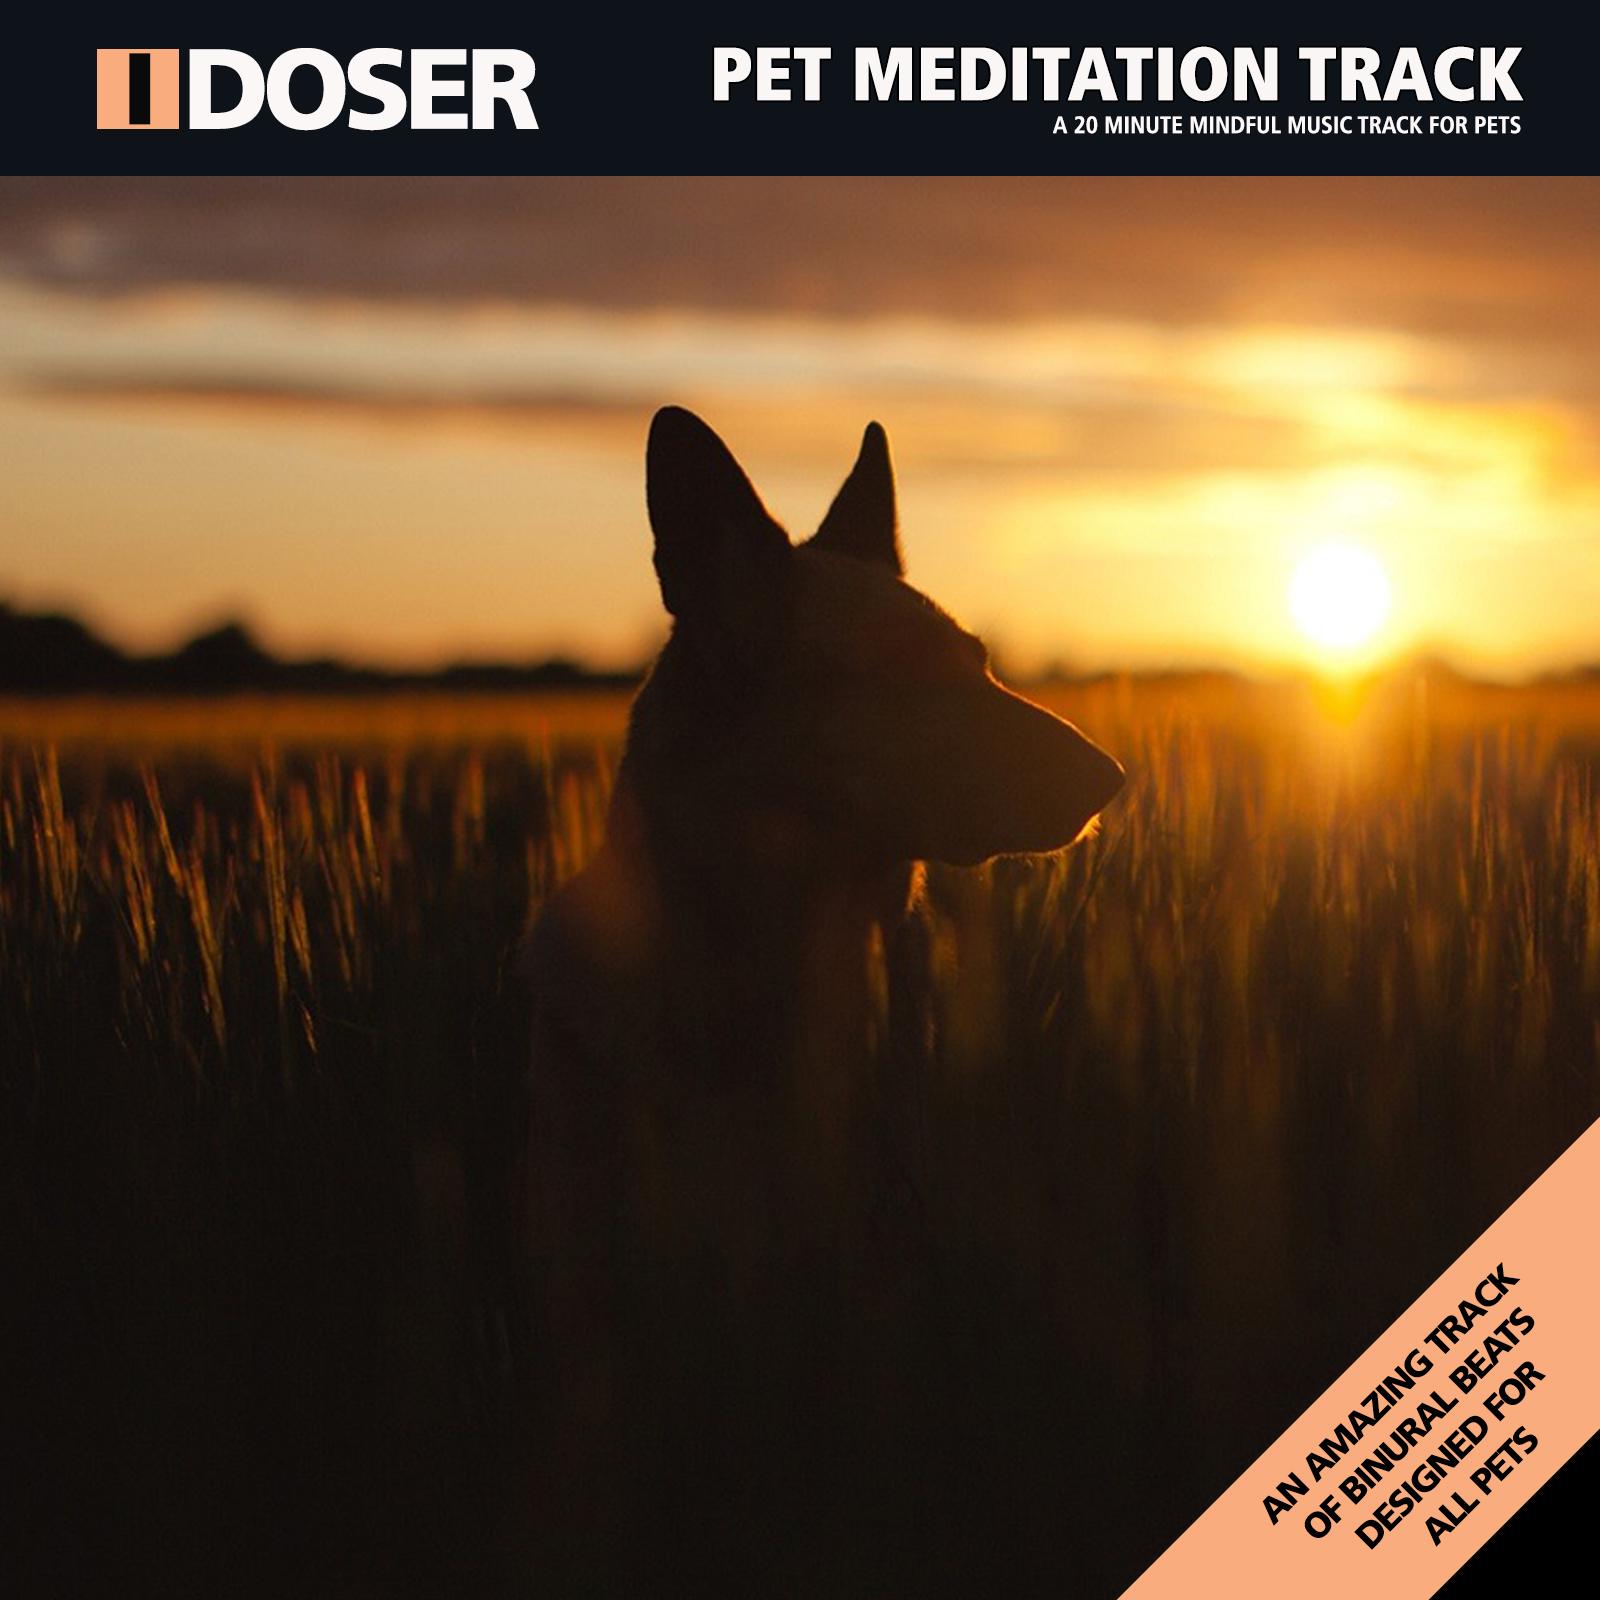 Instant Download MP3s : I-Doser Audio, Brainwave Doses